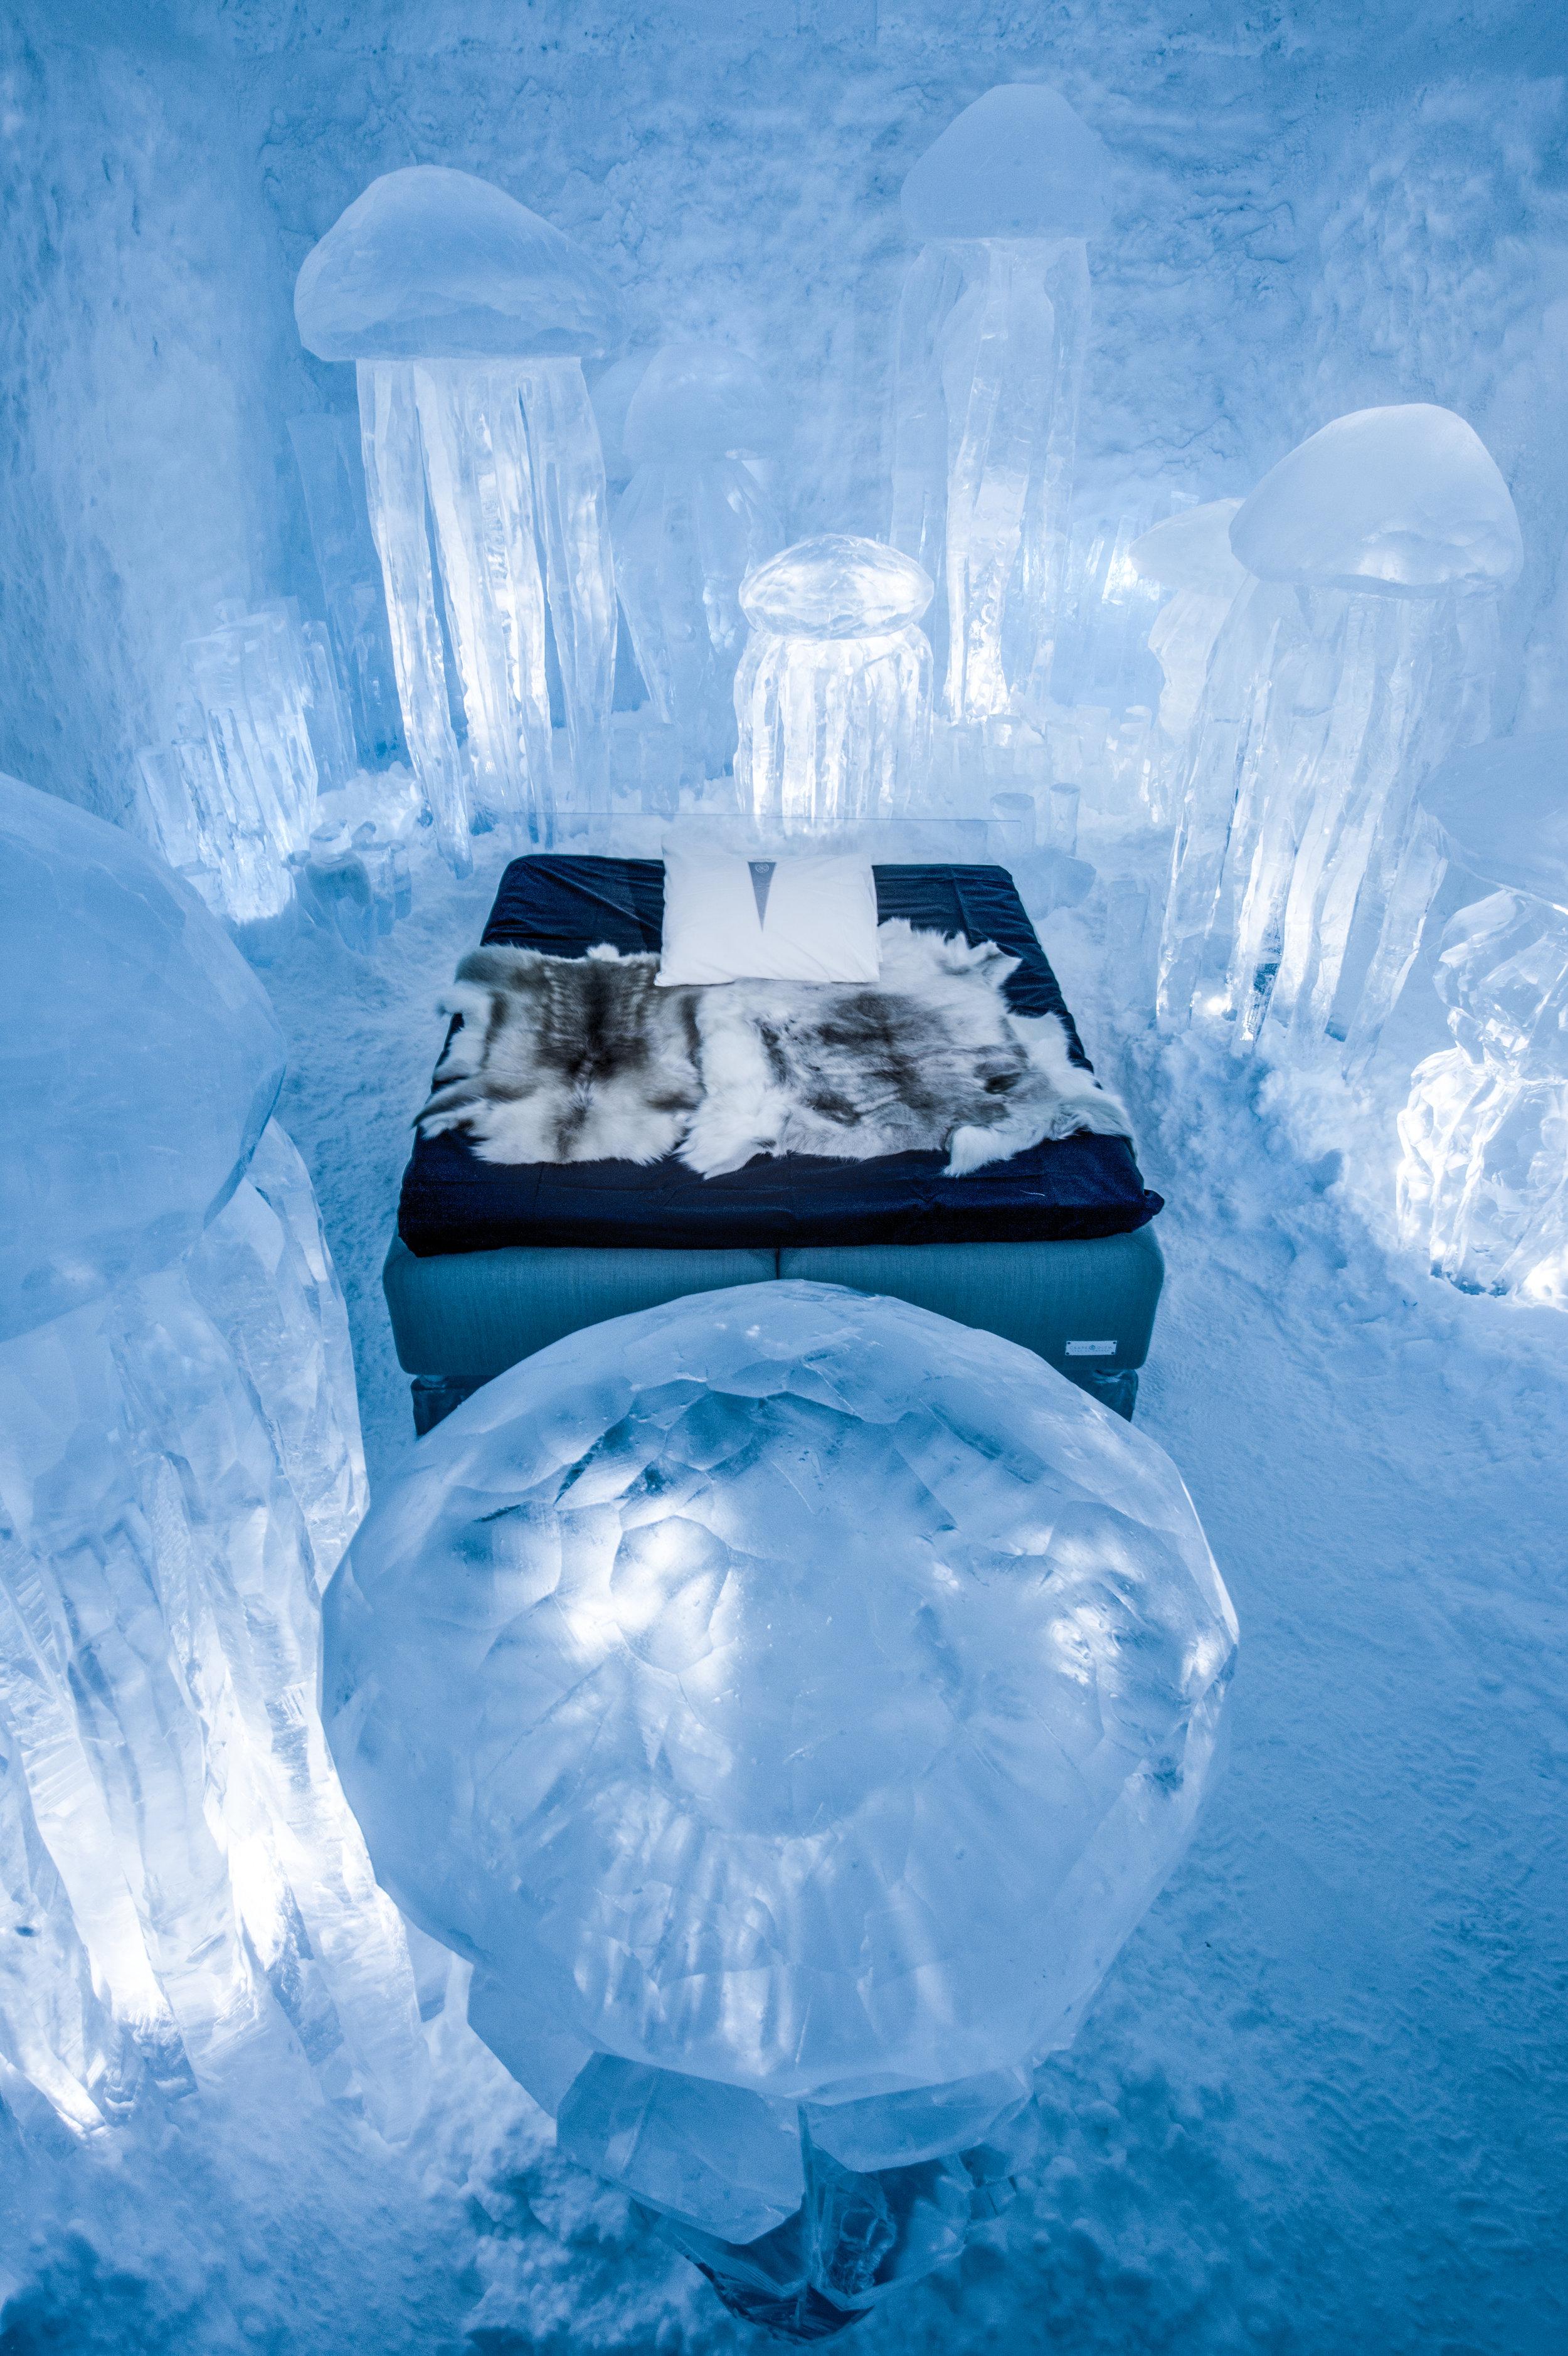 Julia Gamborg Nielsen & Lotta Lampa, Hydro Smack---ICEHOTEL 365 photo by - Asaf Kliger (3 of 4) (1 of 1).jpg